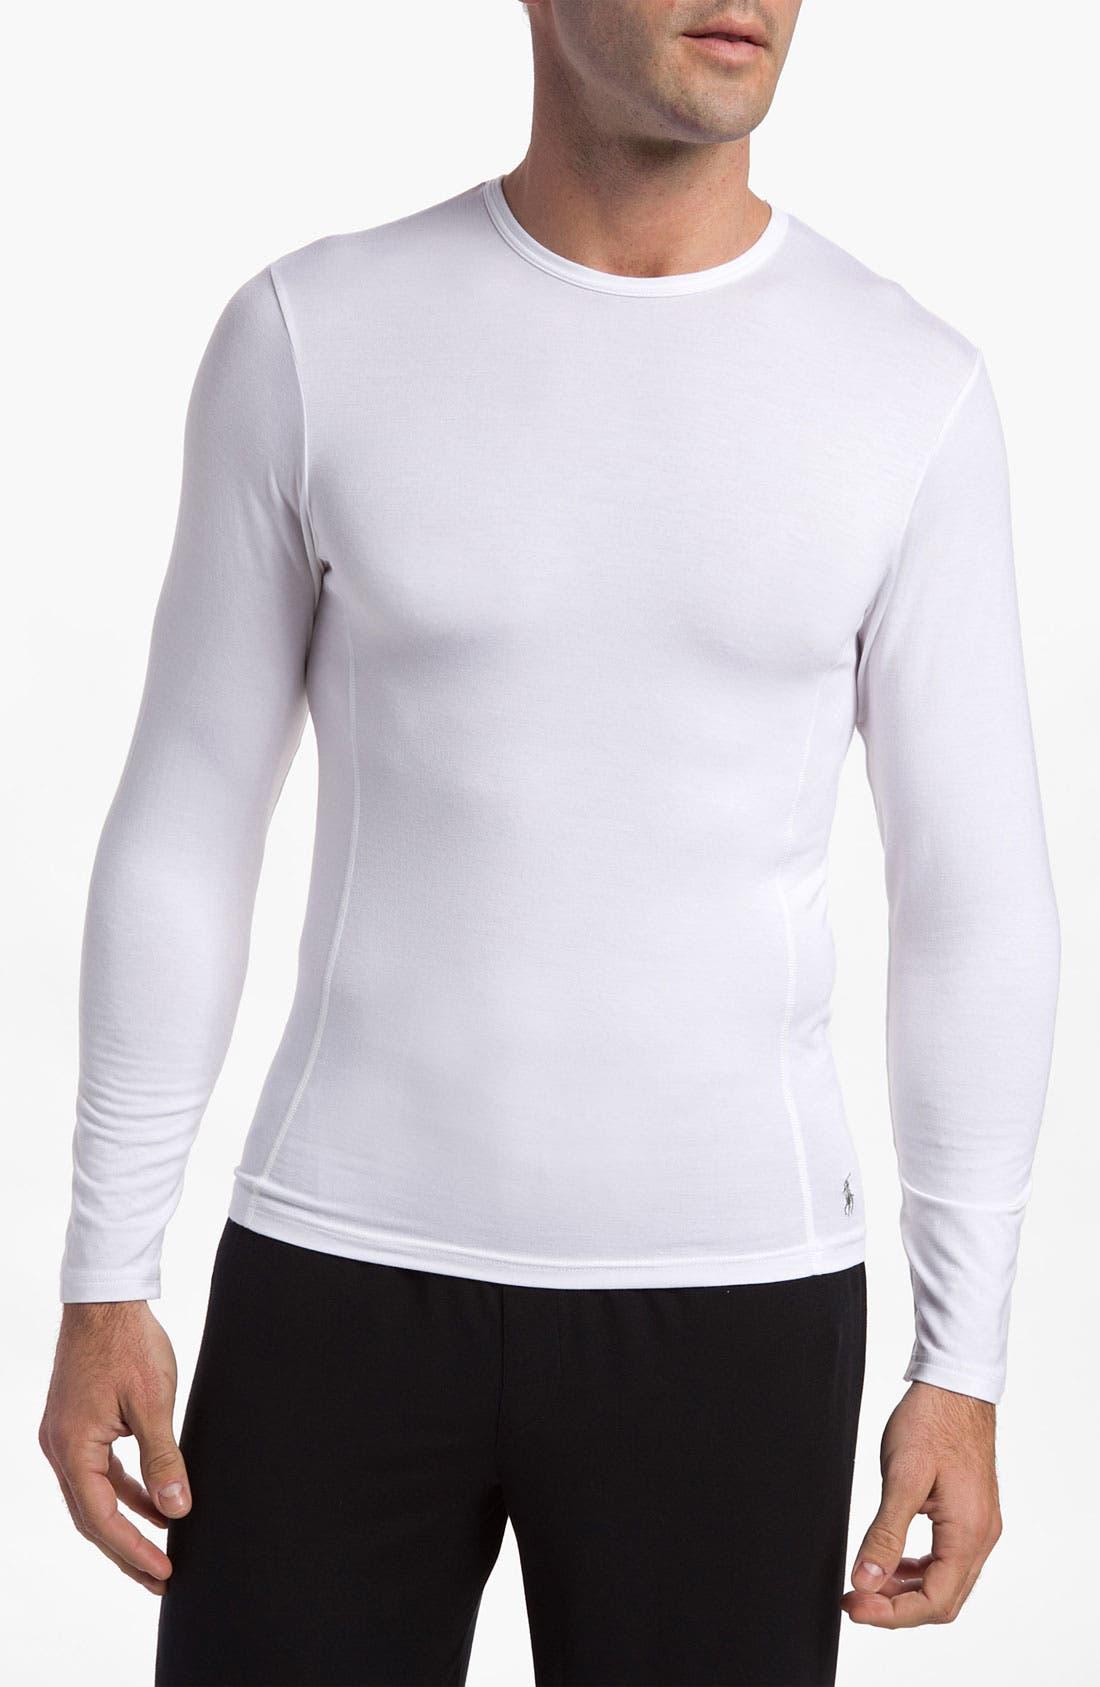 Main Image - Polo Ralph Lauren Long Sleeve Crewneck Modal Shirt